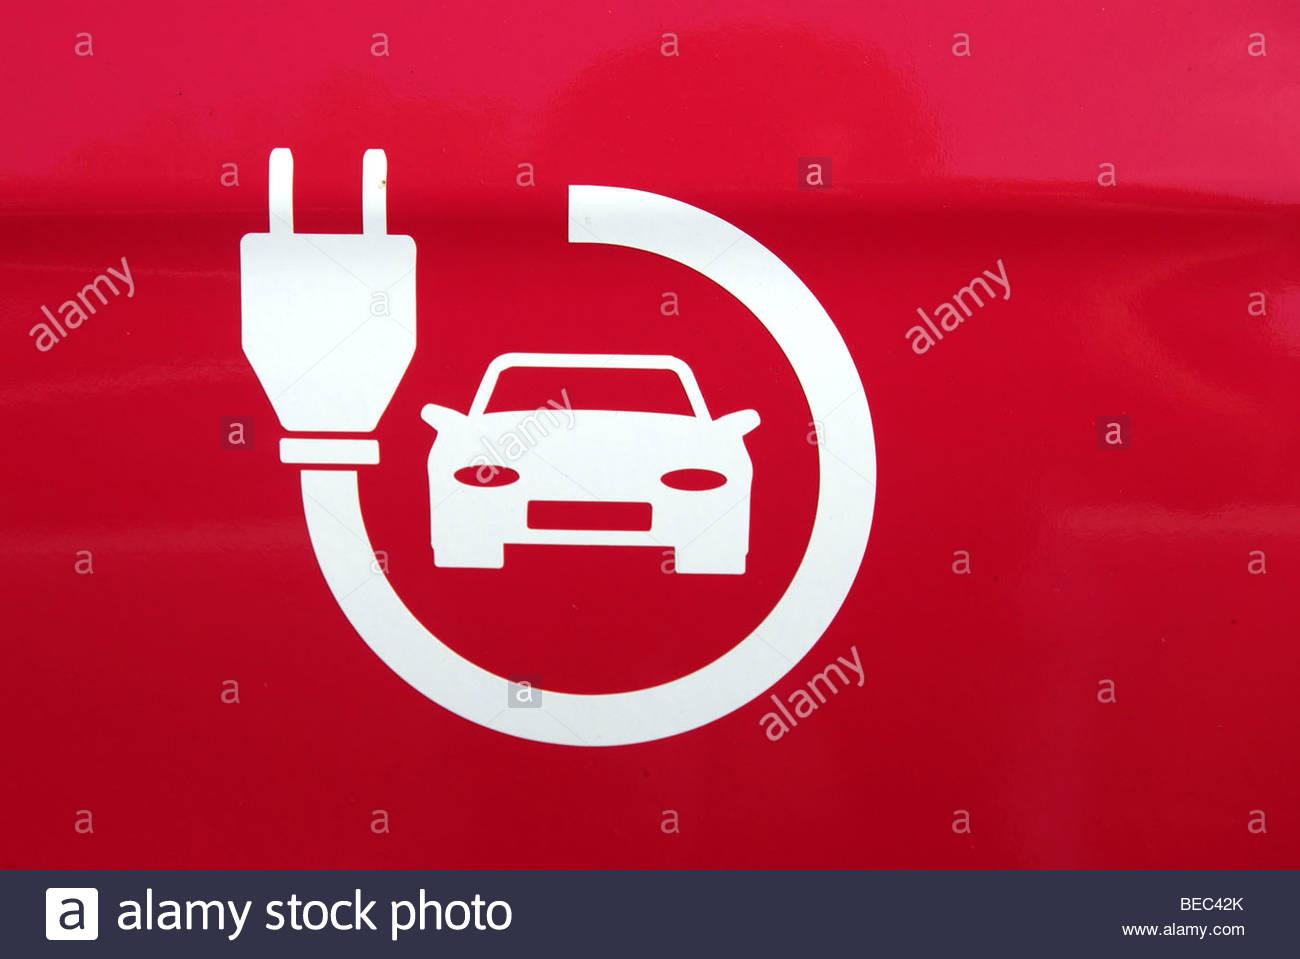 Electric Car Symbol Stockfotos & Electric Car Symbol Bilder - Alamy